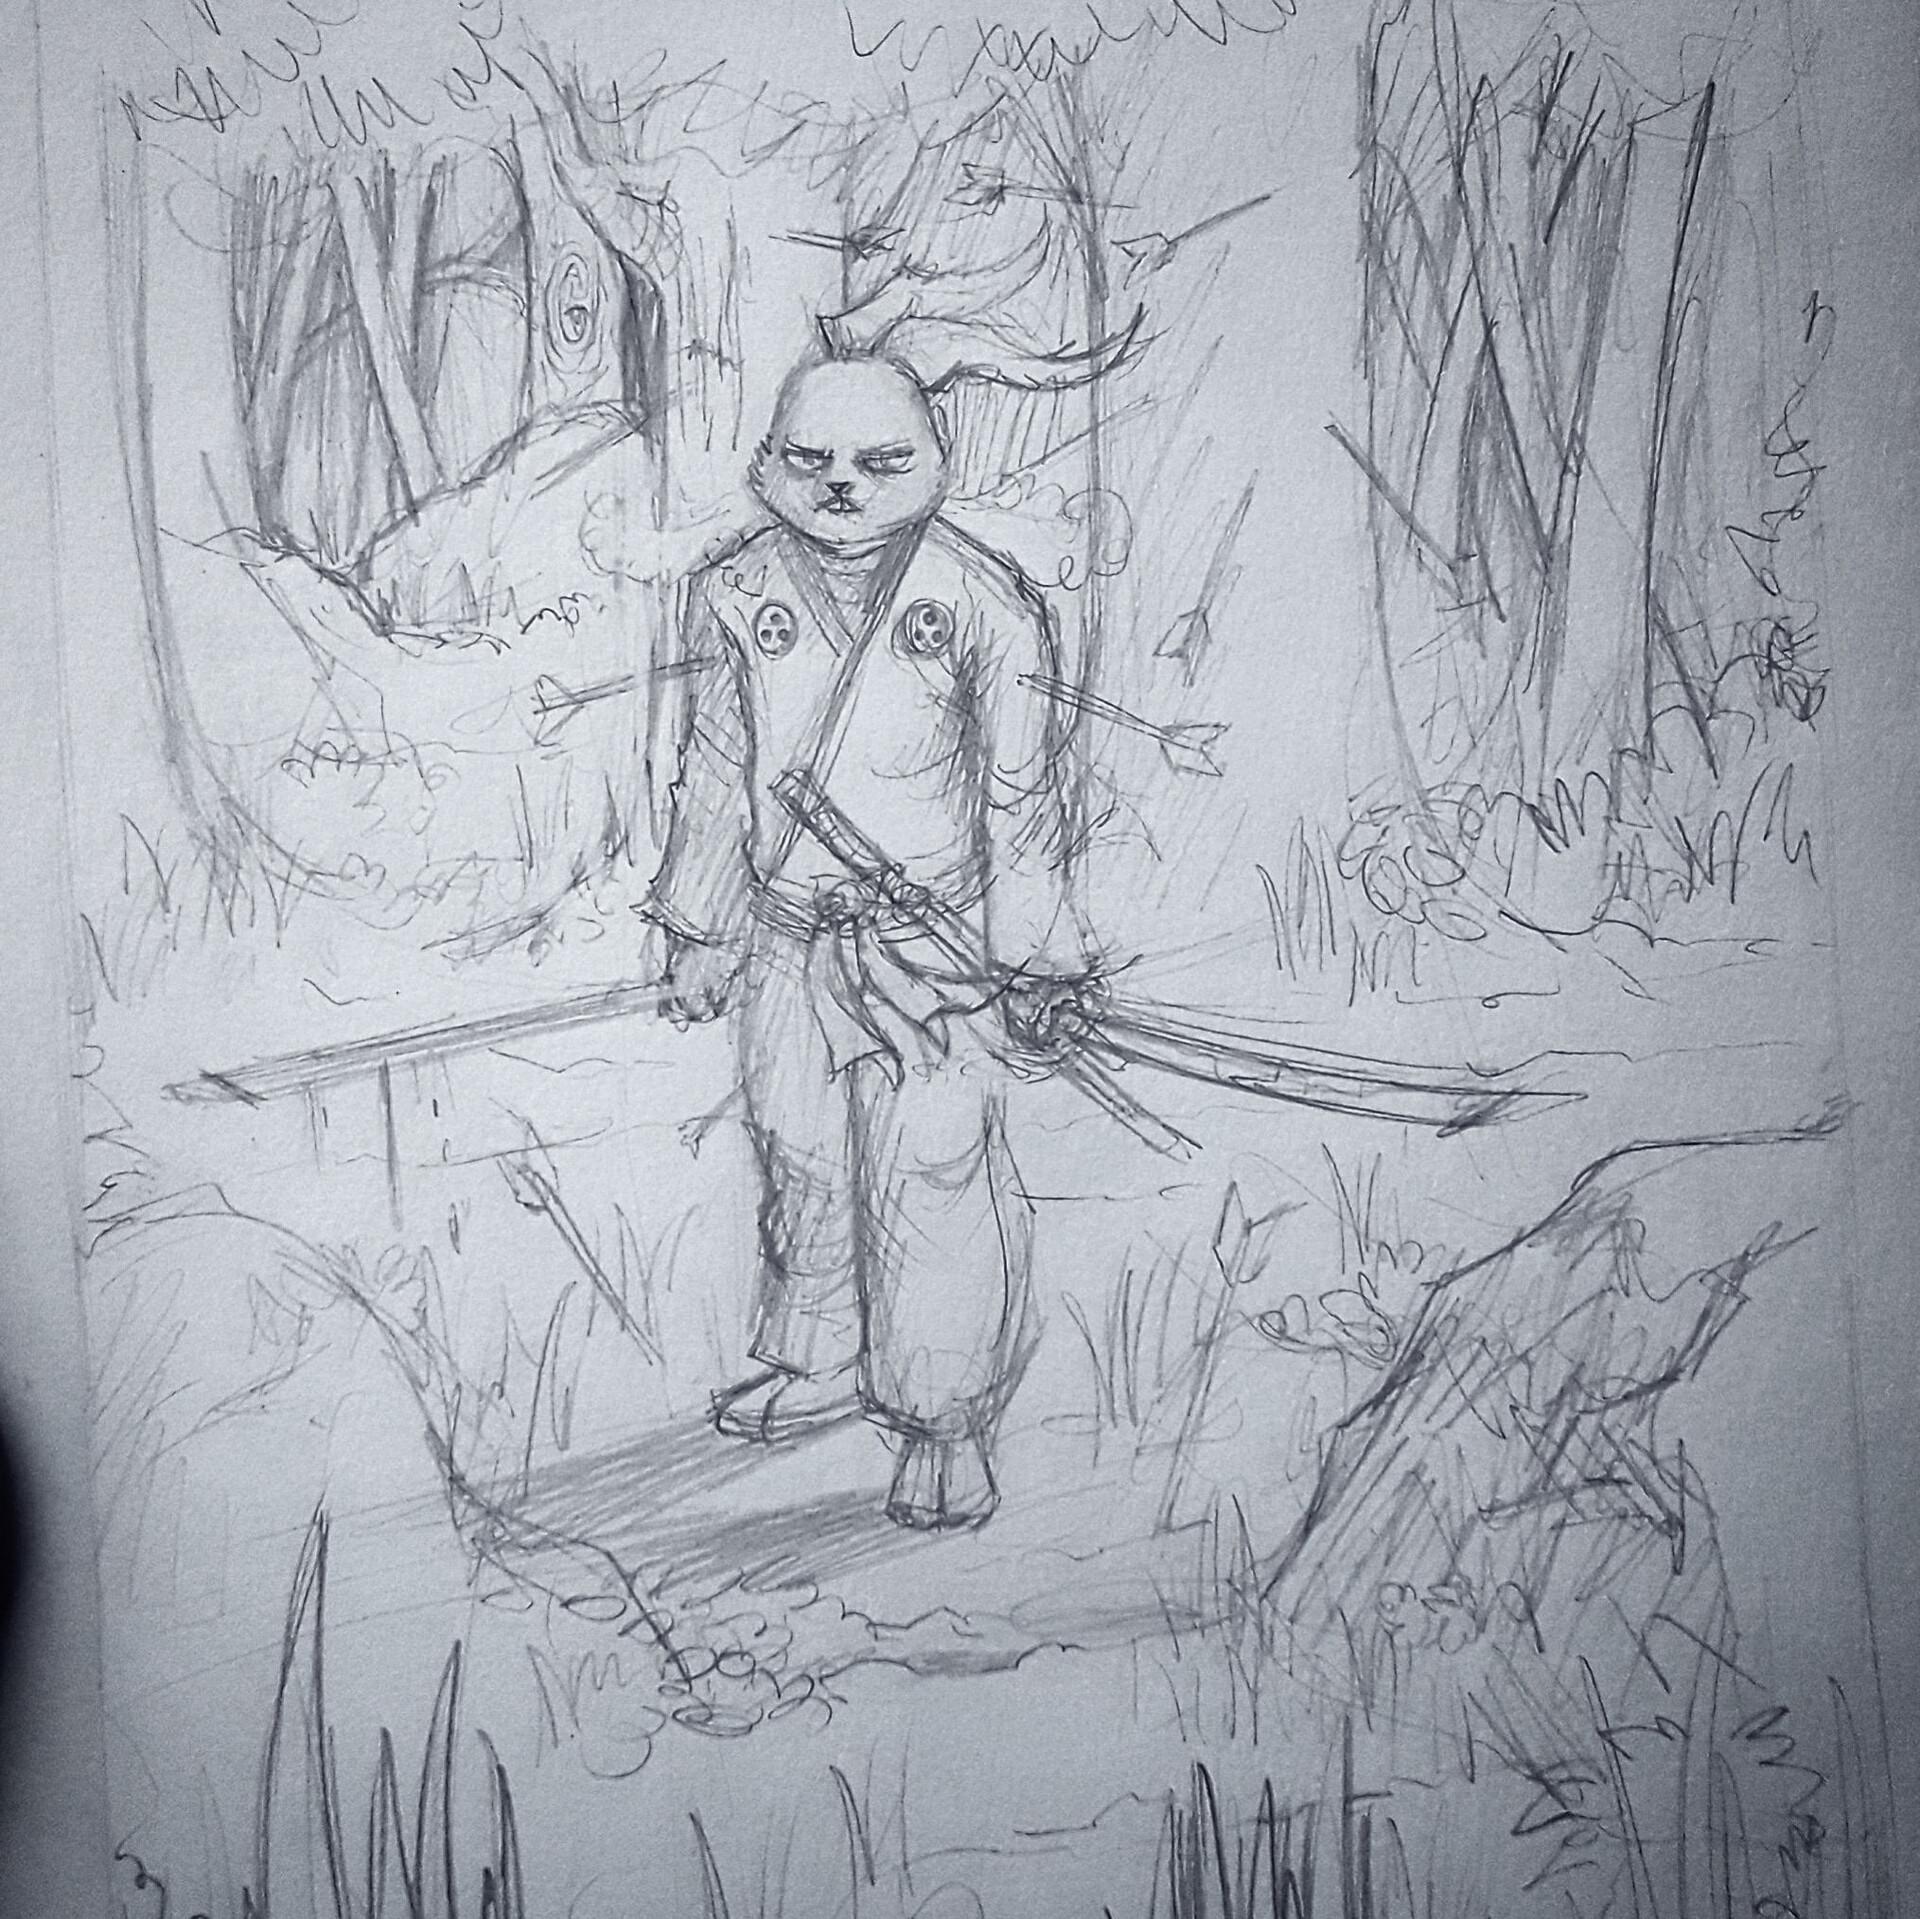 Usagi Yojimbo commission pencil rough